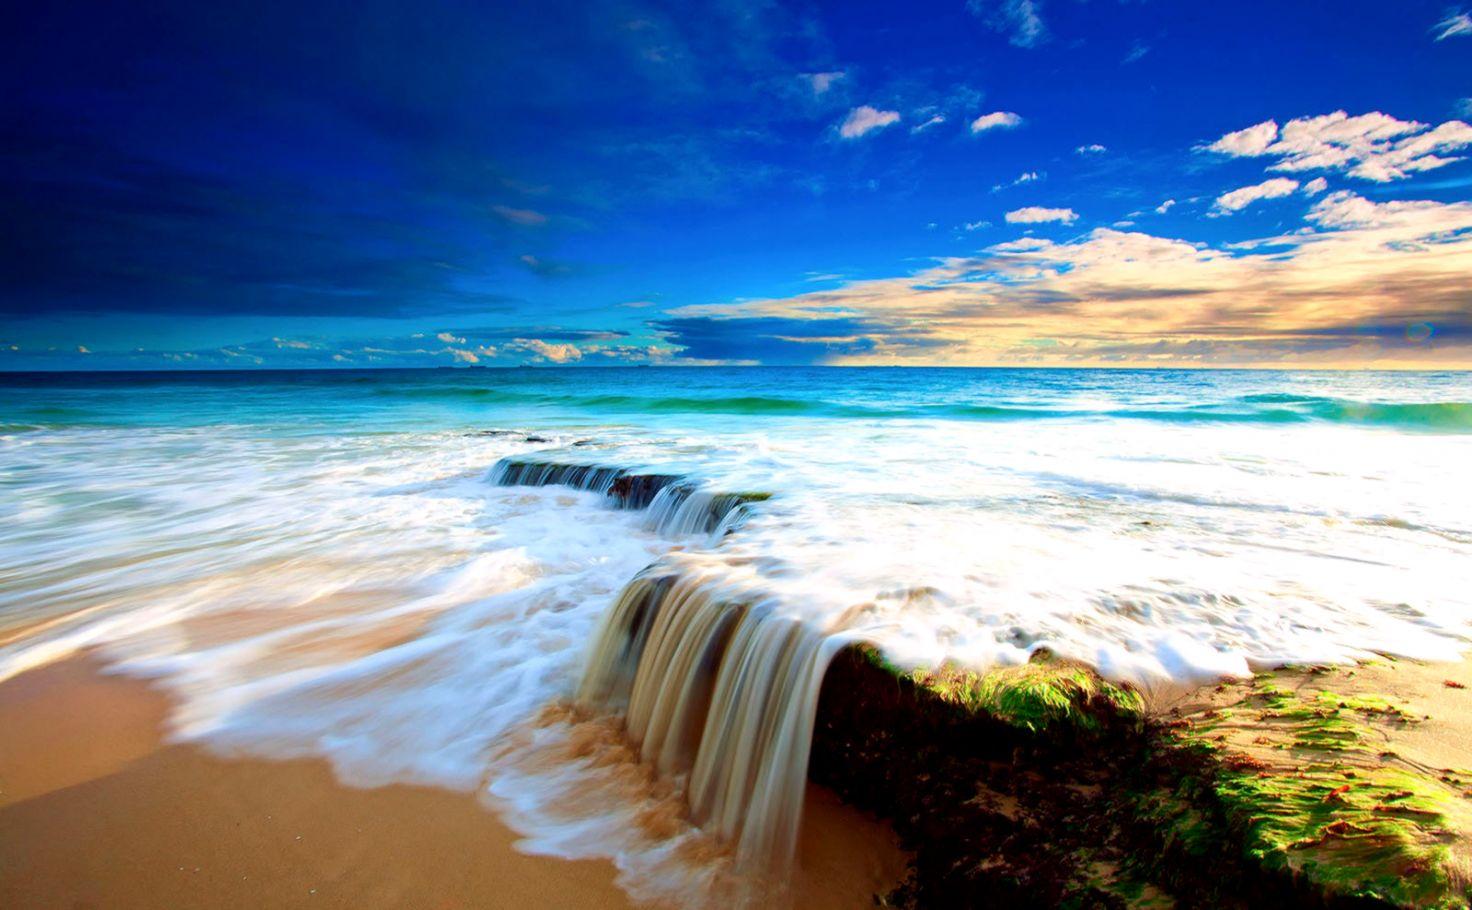 Desktop Background Beach Decor di Design 1472x910